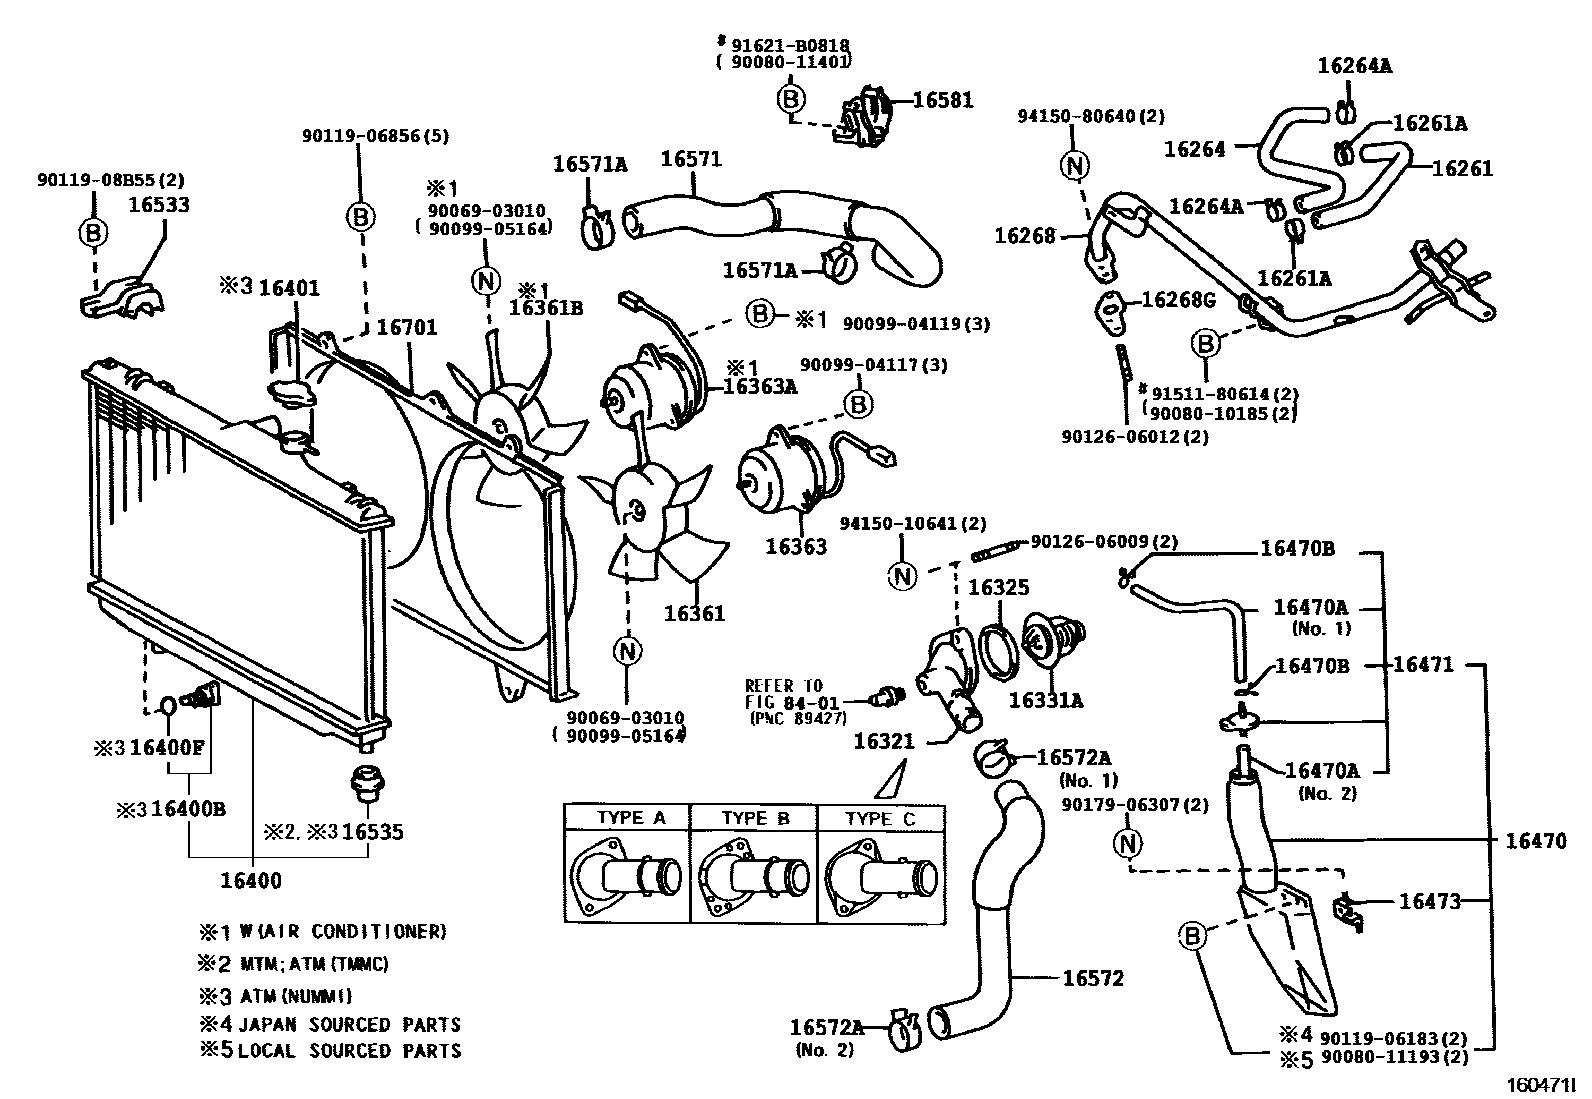 wiring diagram 2001 s10 zr2 2001 s10 headlight wiring